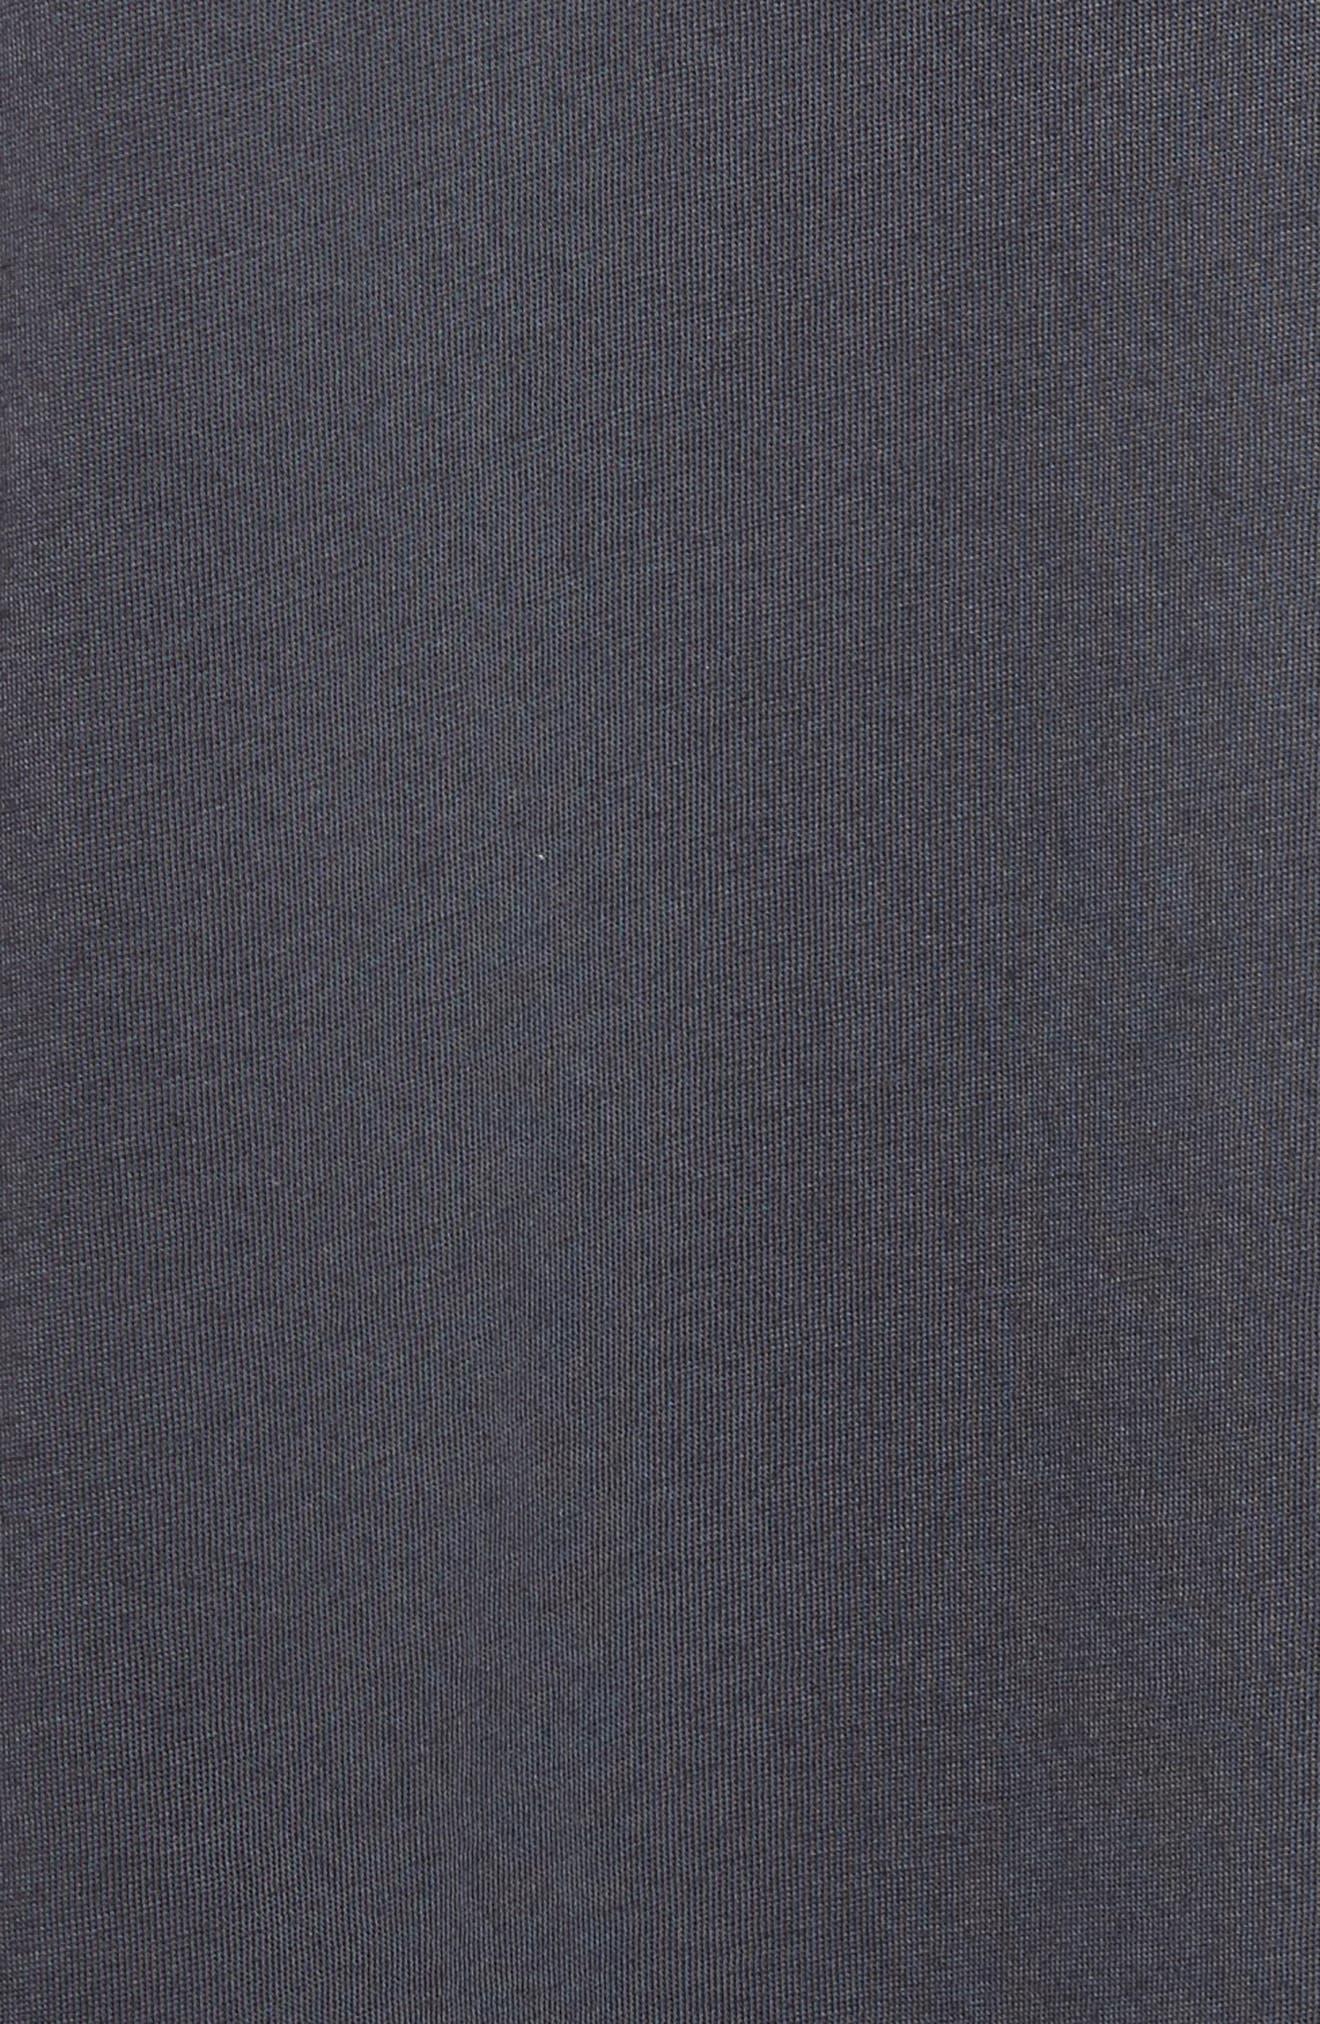 REBECCA TAYLOR, Glitter Jersey Tee, Alternate thumbnail 5, color, 020